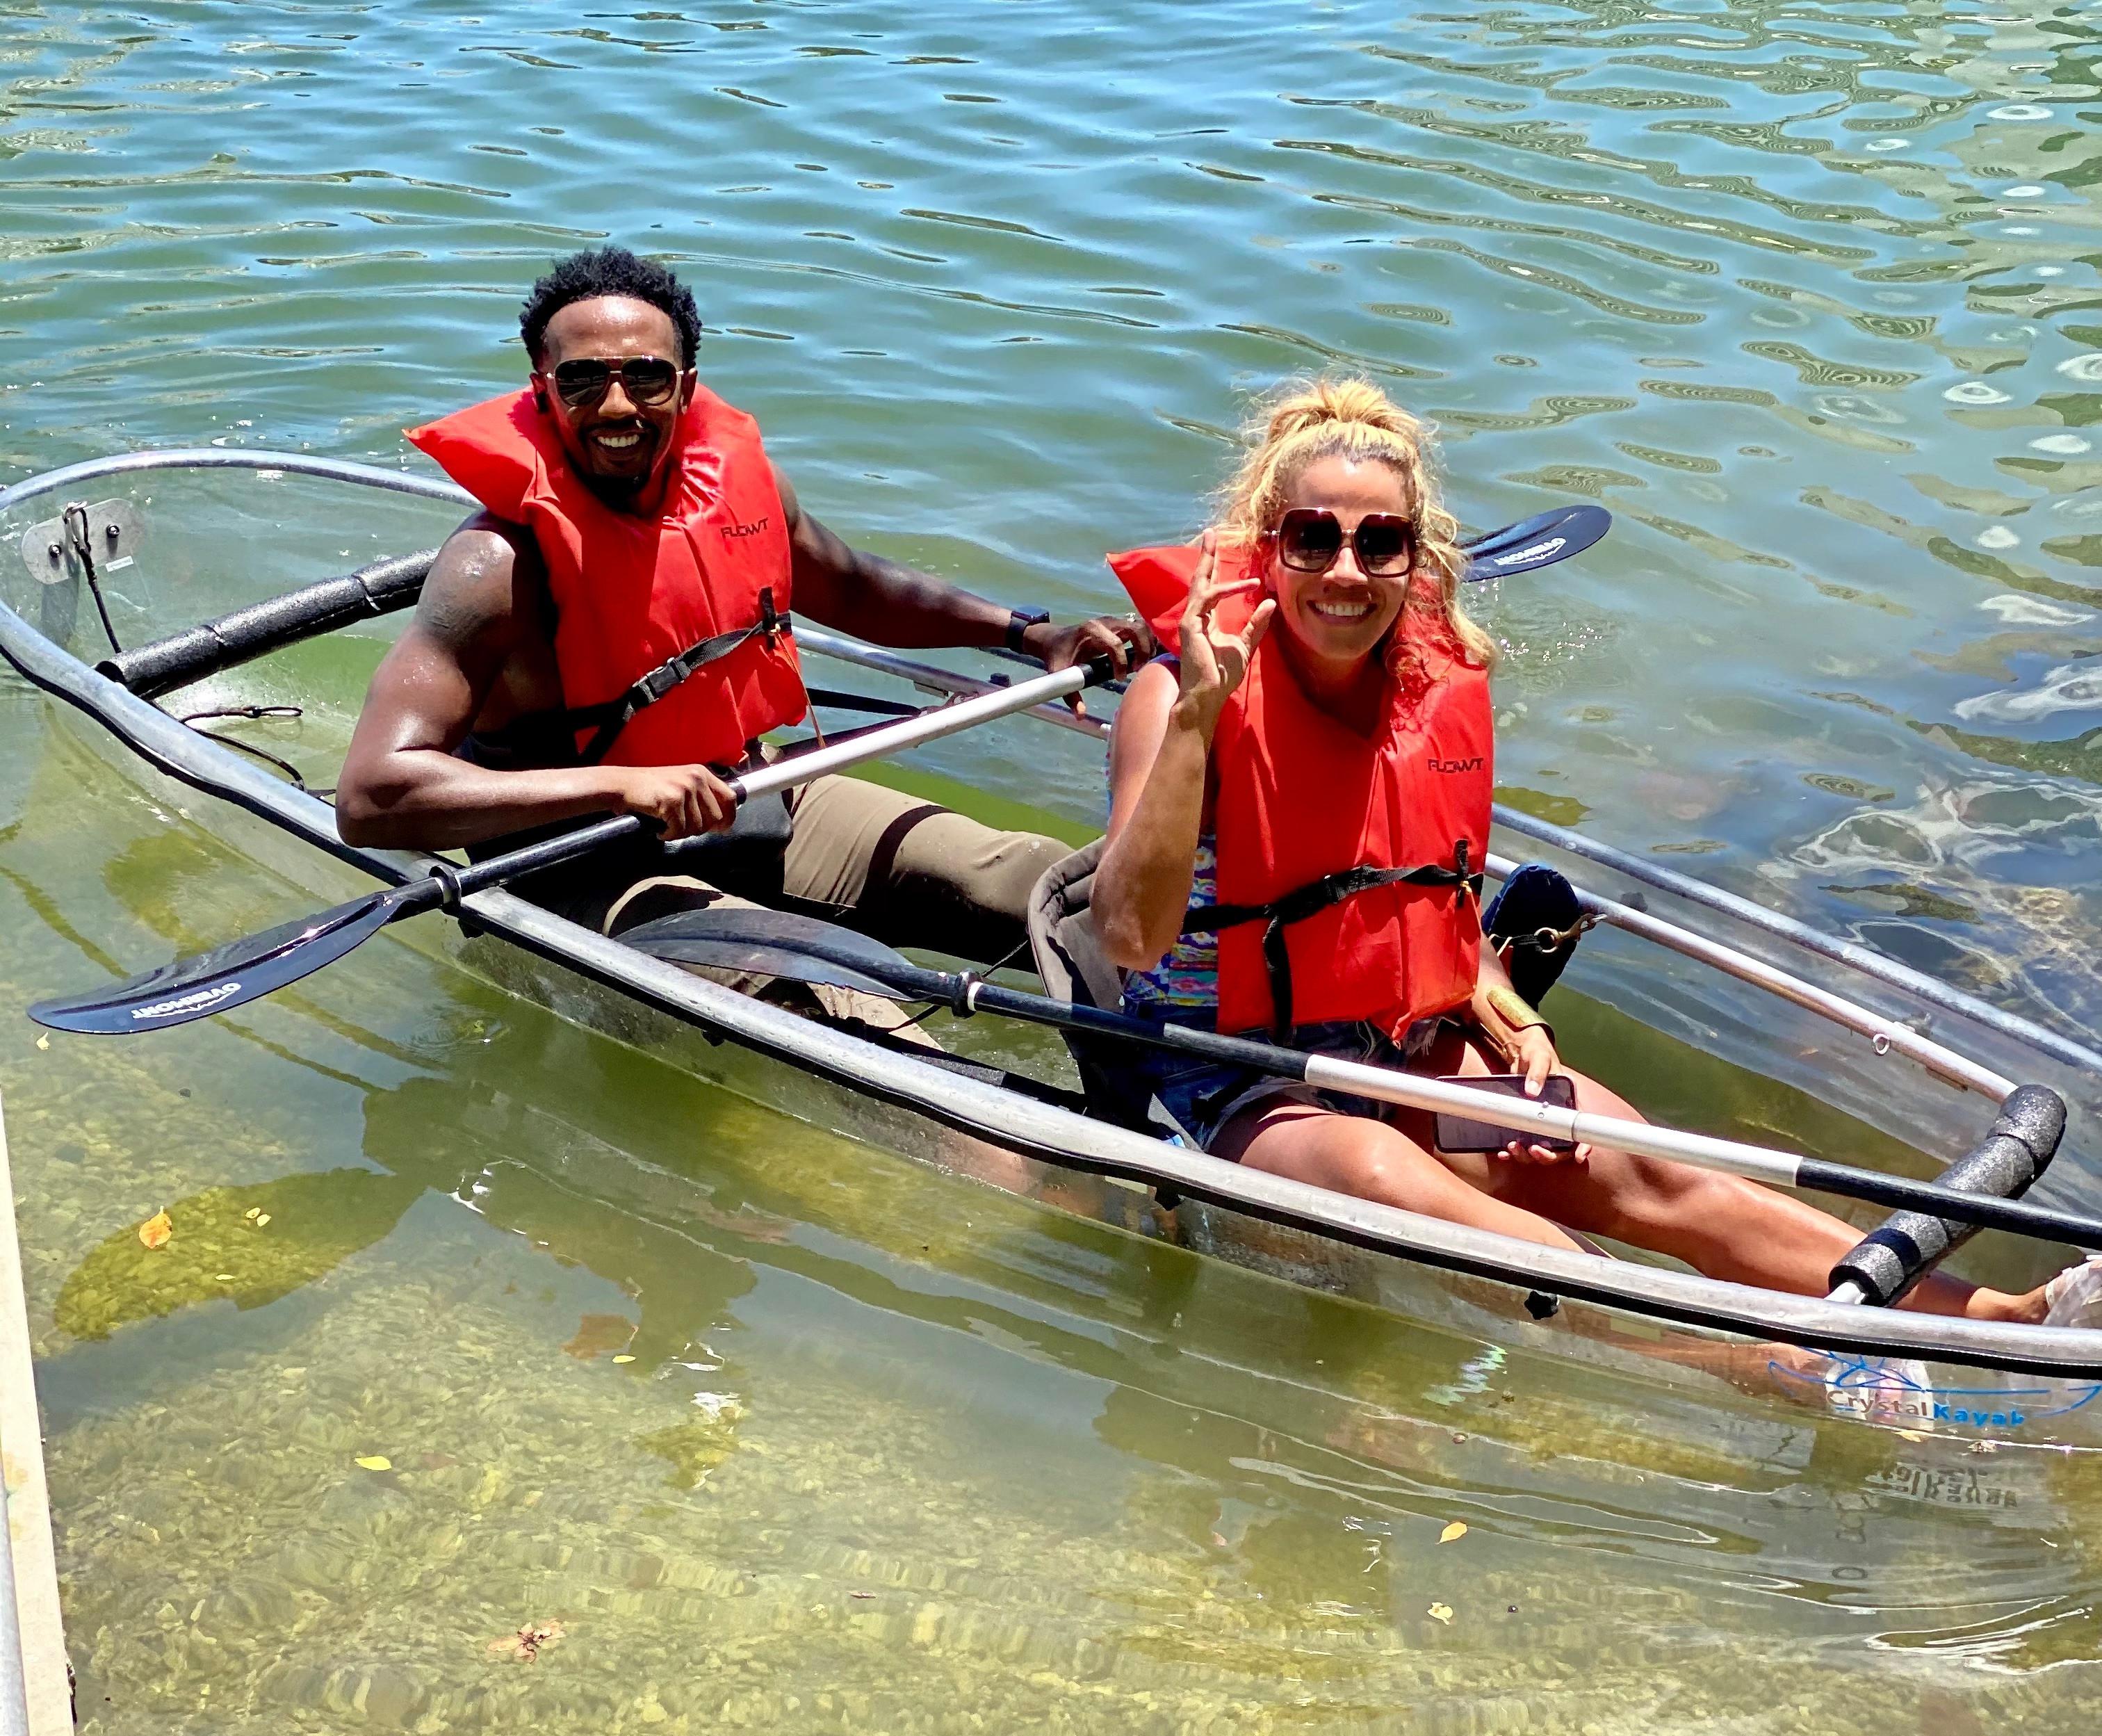 Clear Kayak Rental (Double) - 1 Hr